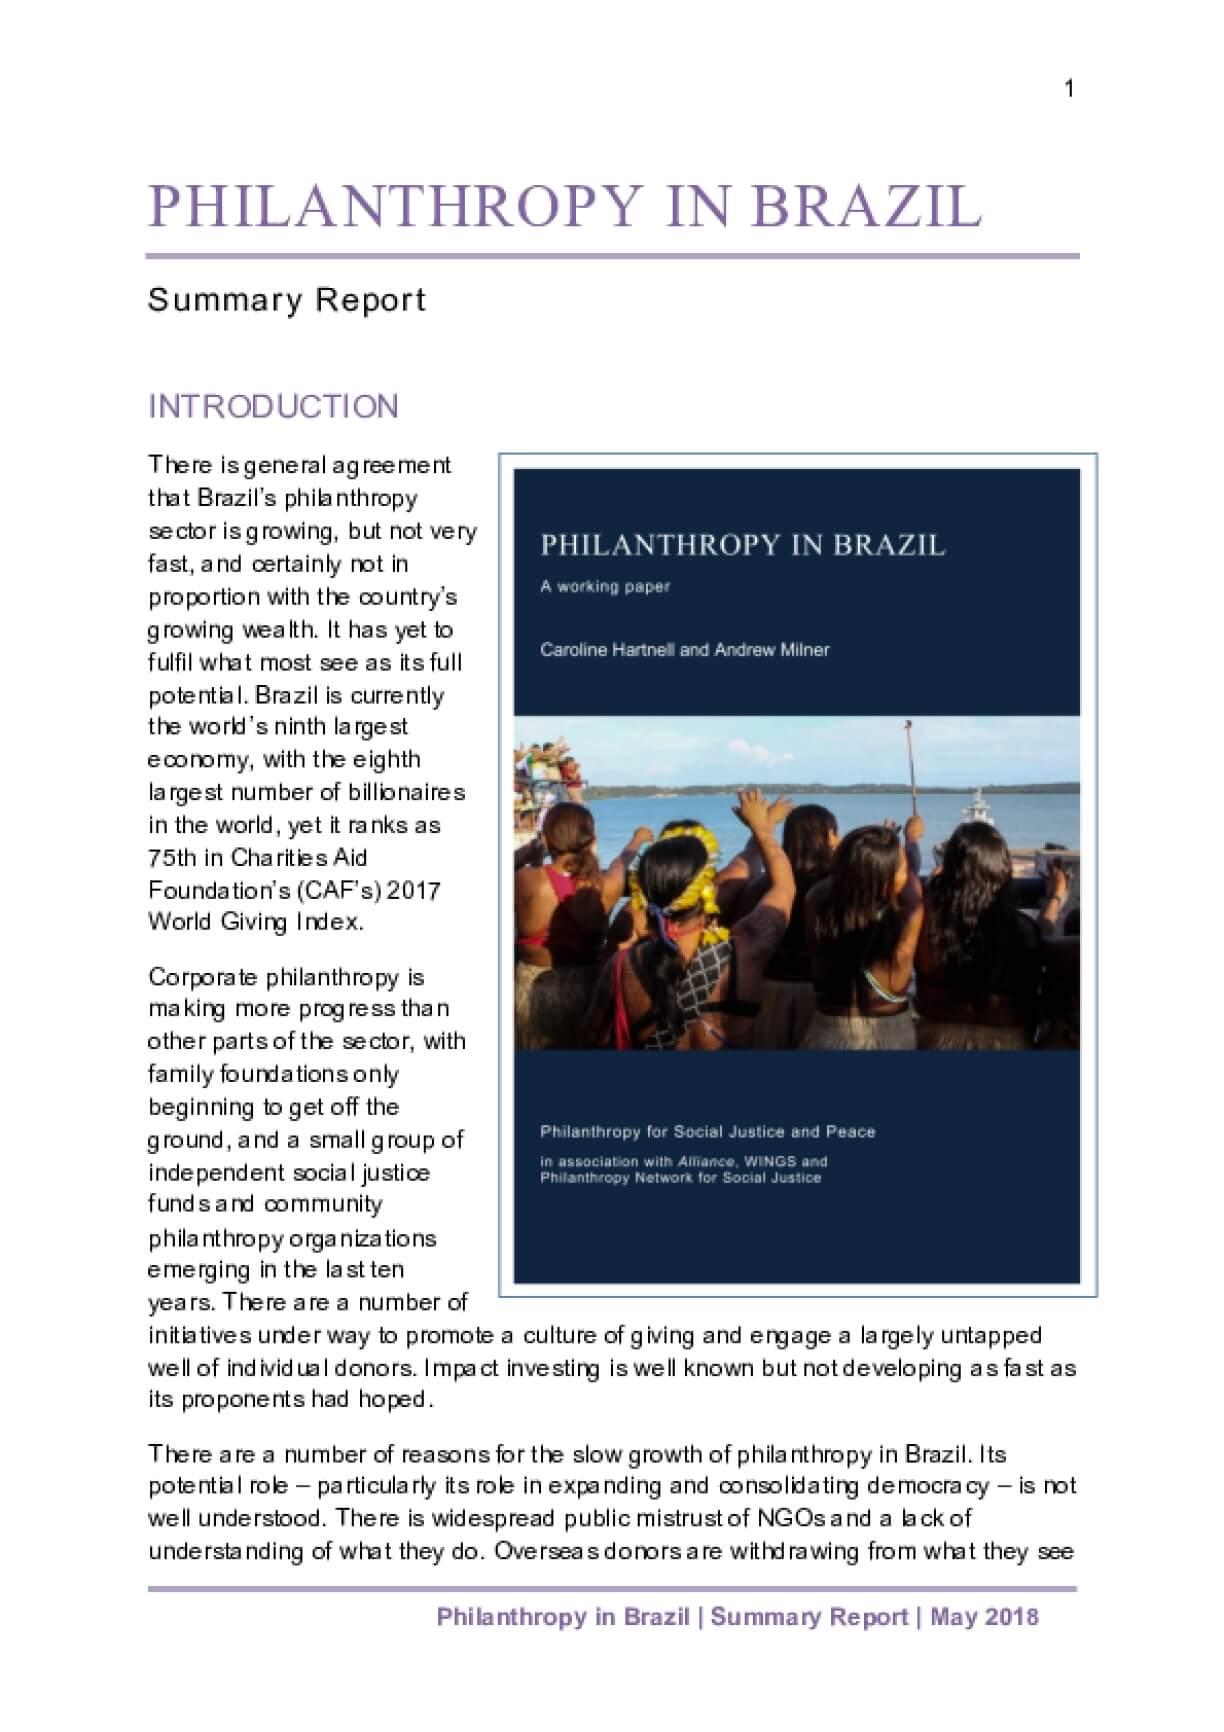 Philanthropy in Brazil - Summary in English